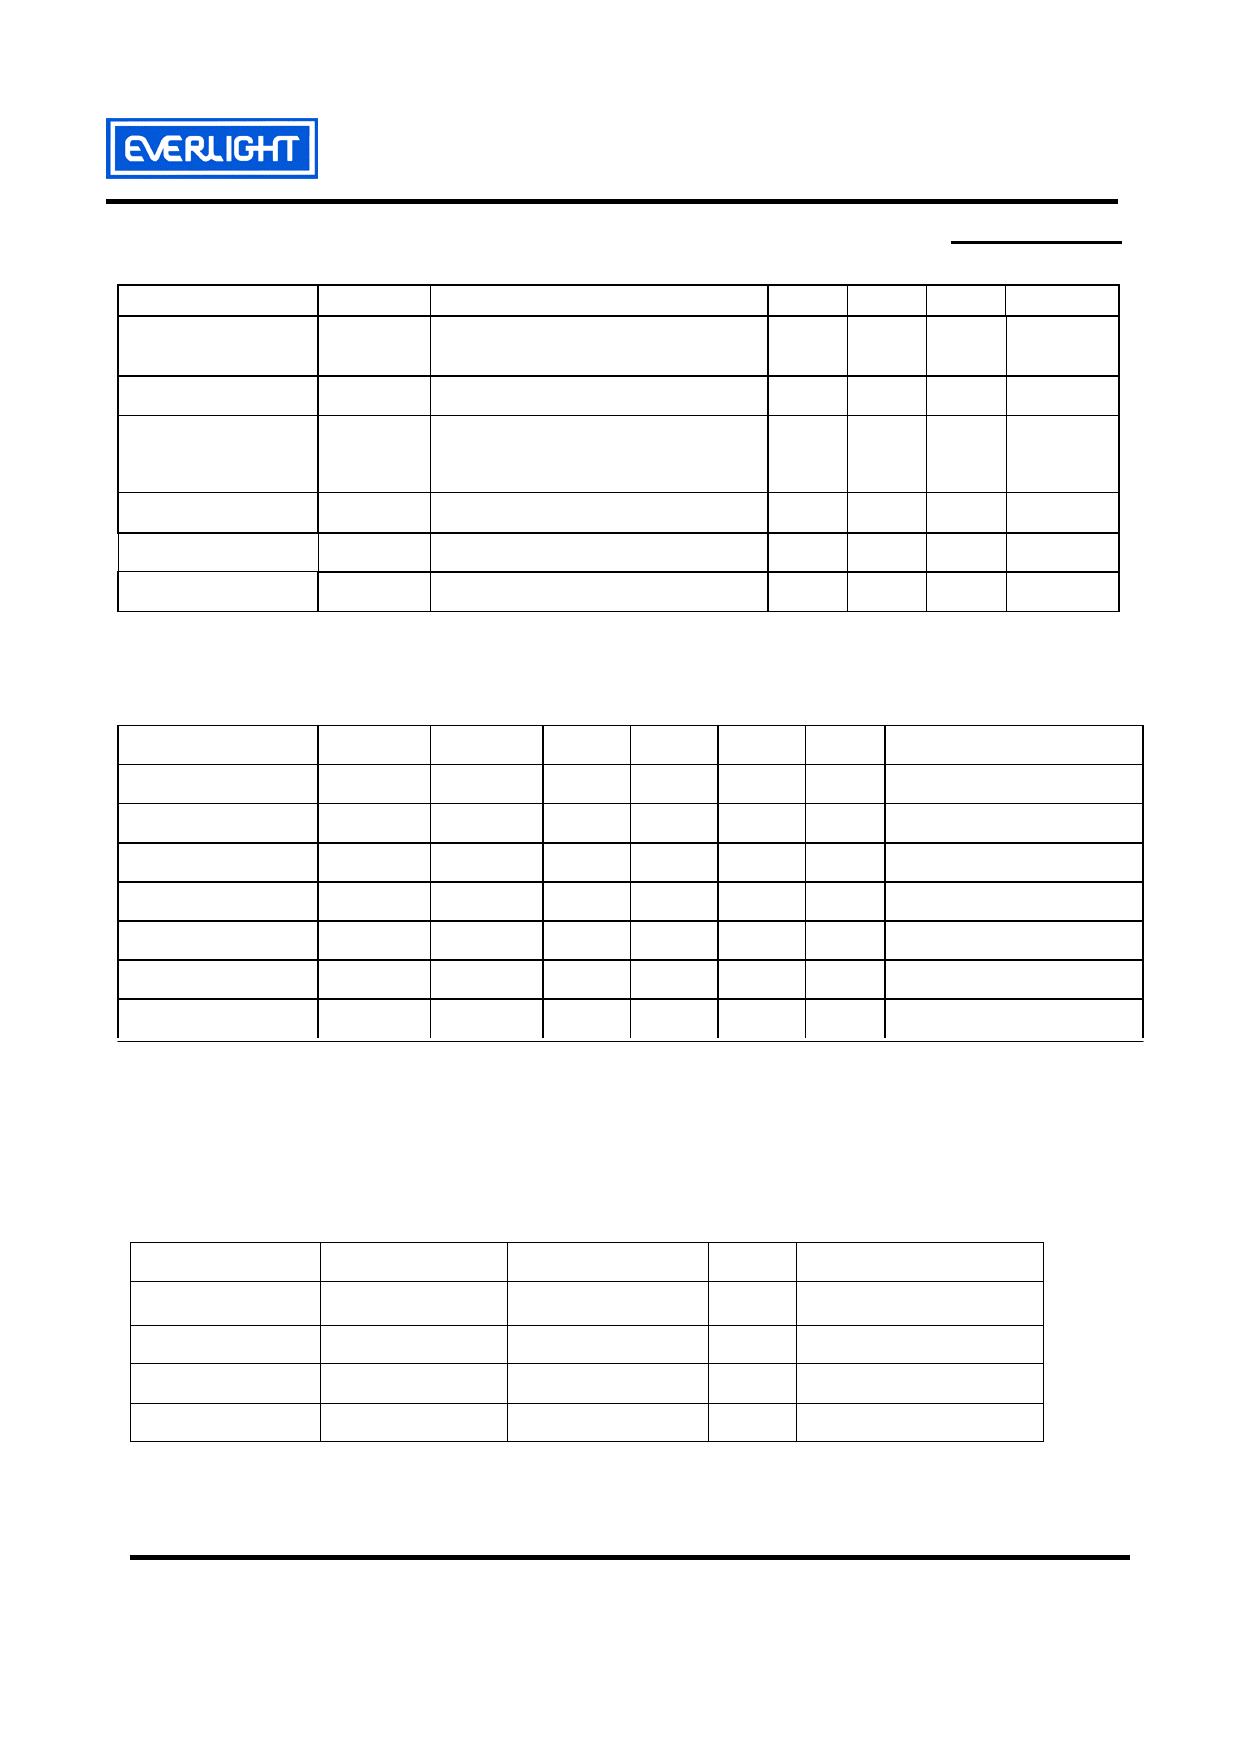 IR908-7C-F pdf, ピン配列